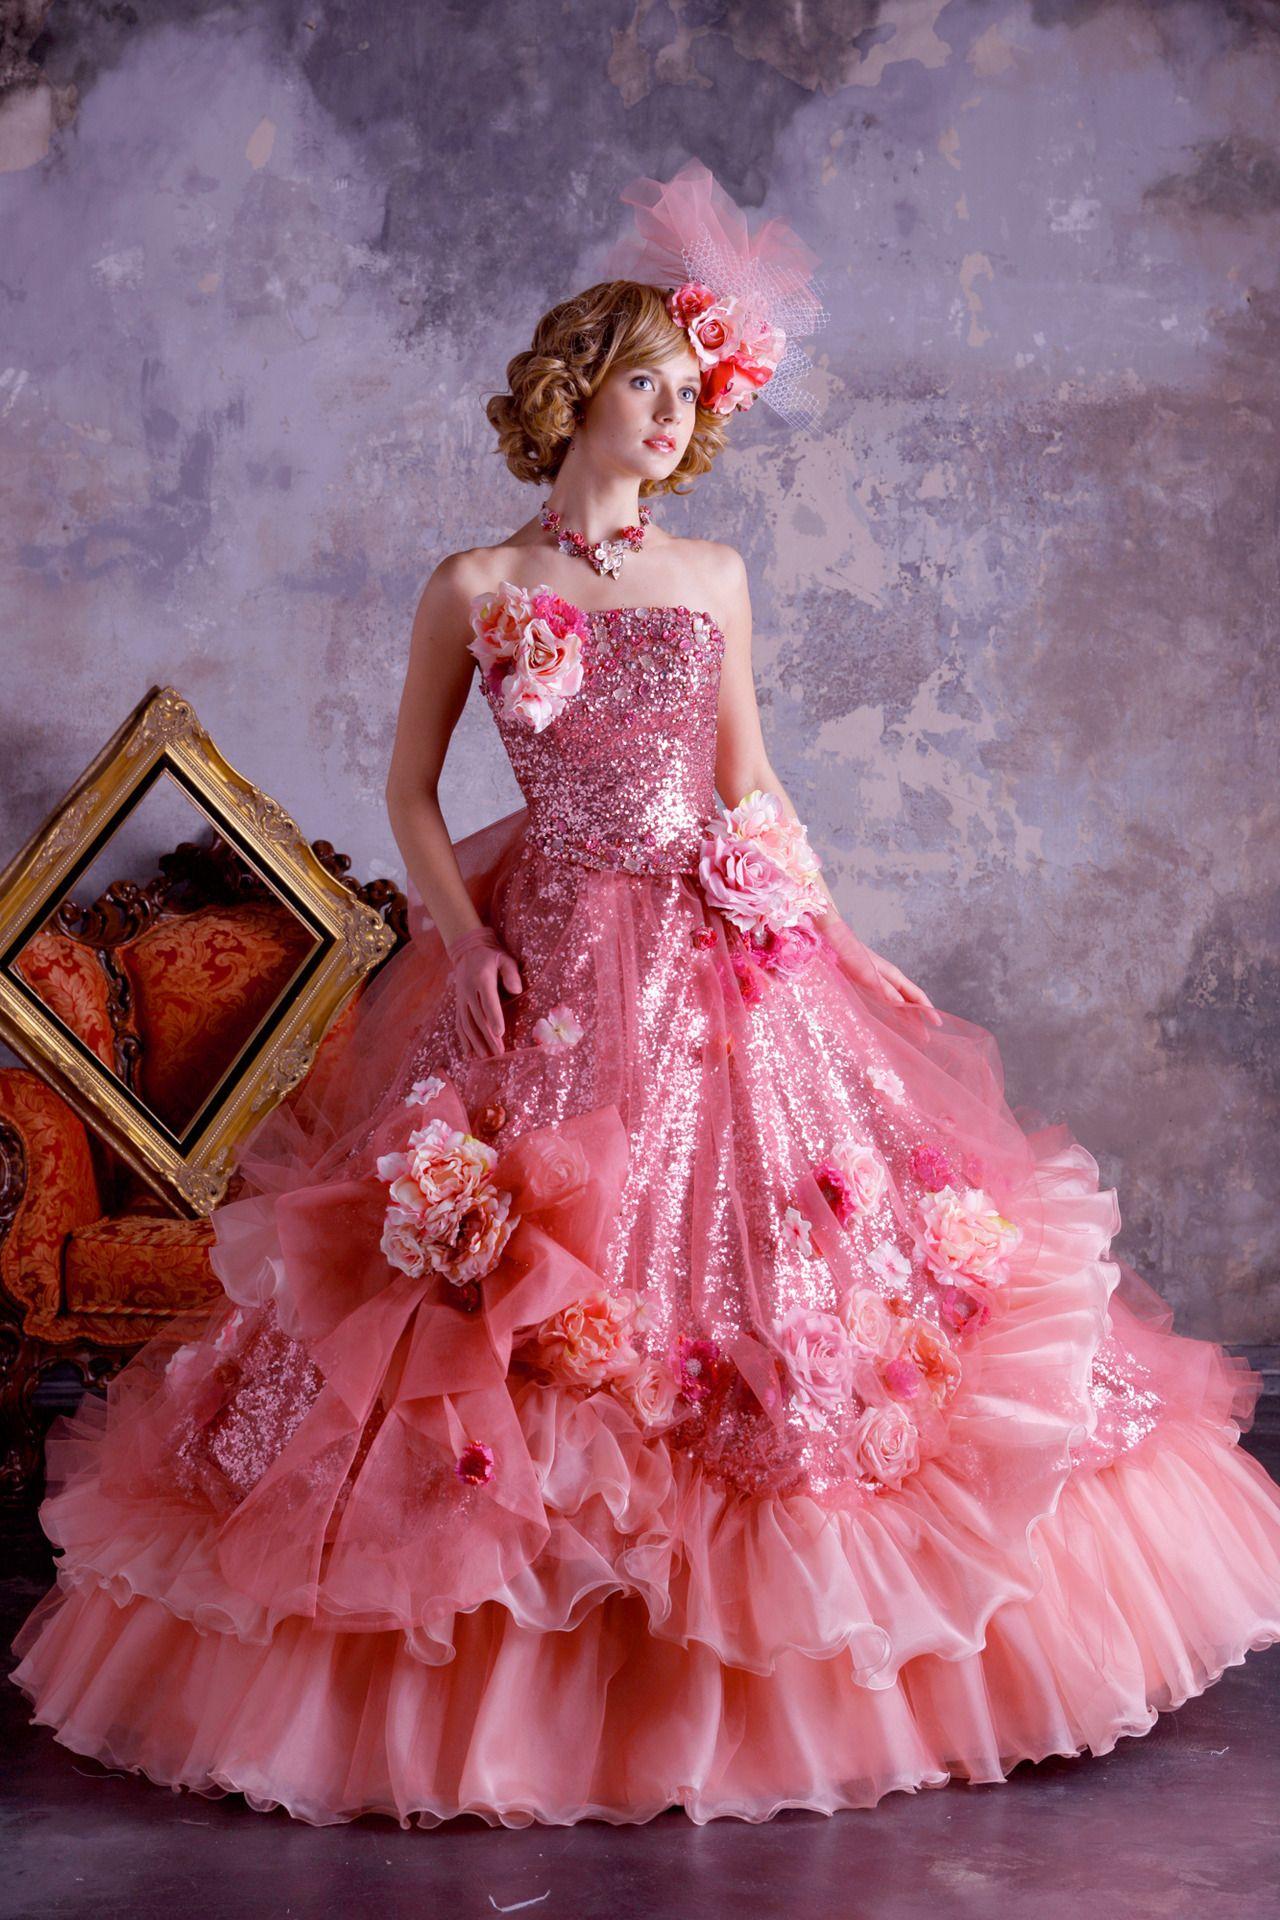 I think this might be a Stella de Libero dress. HC